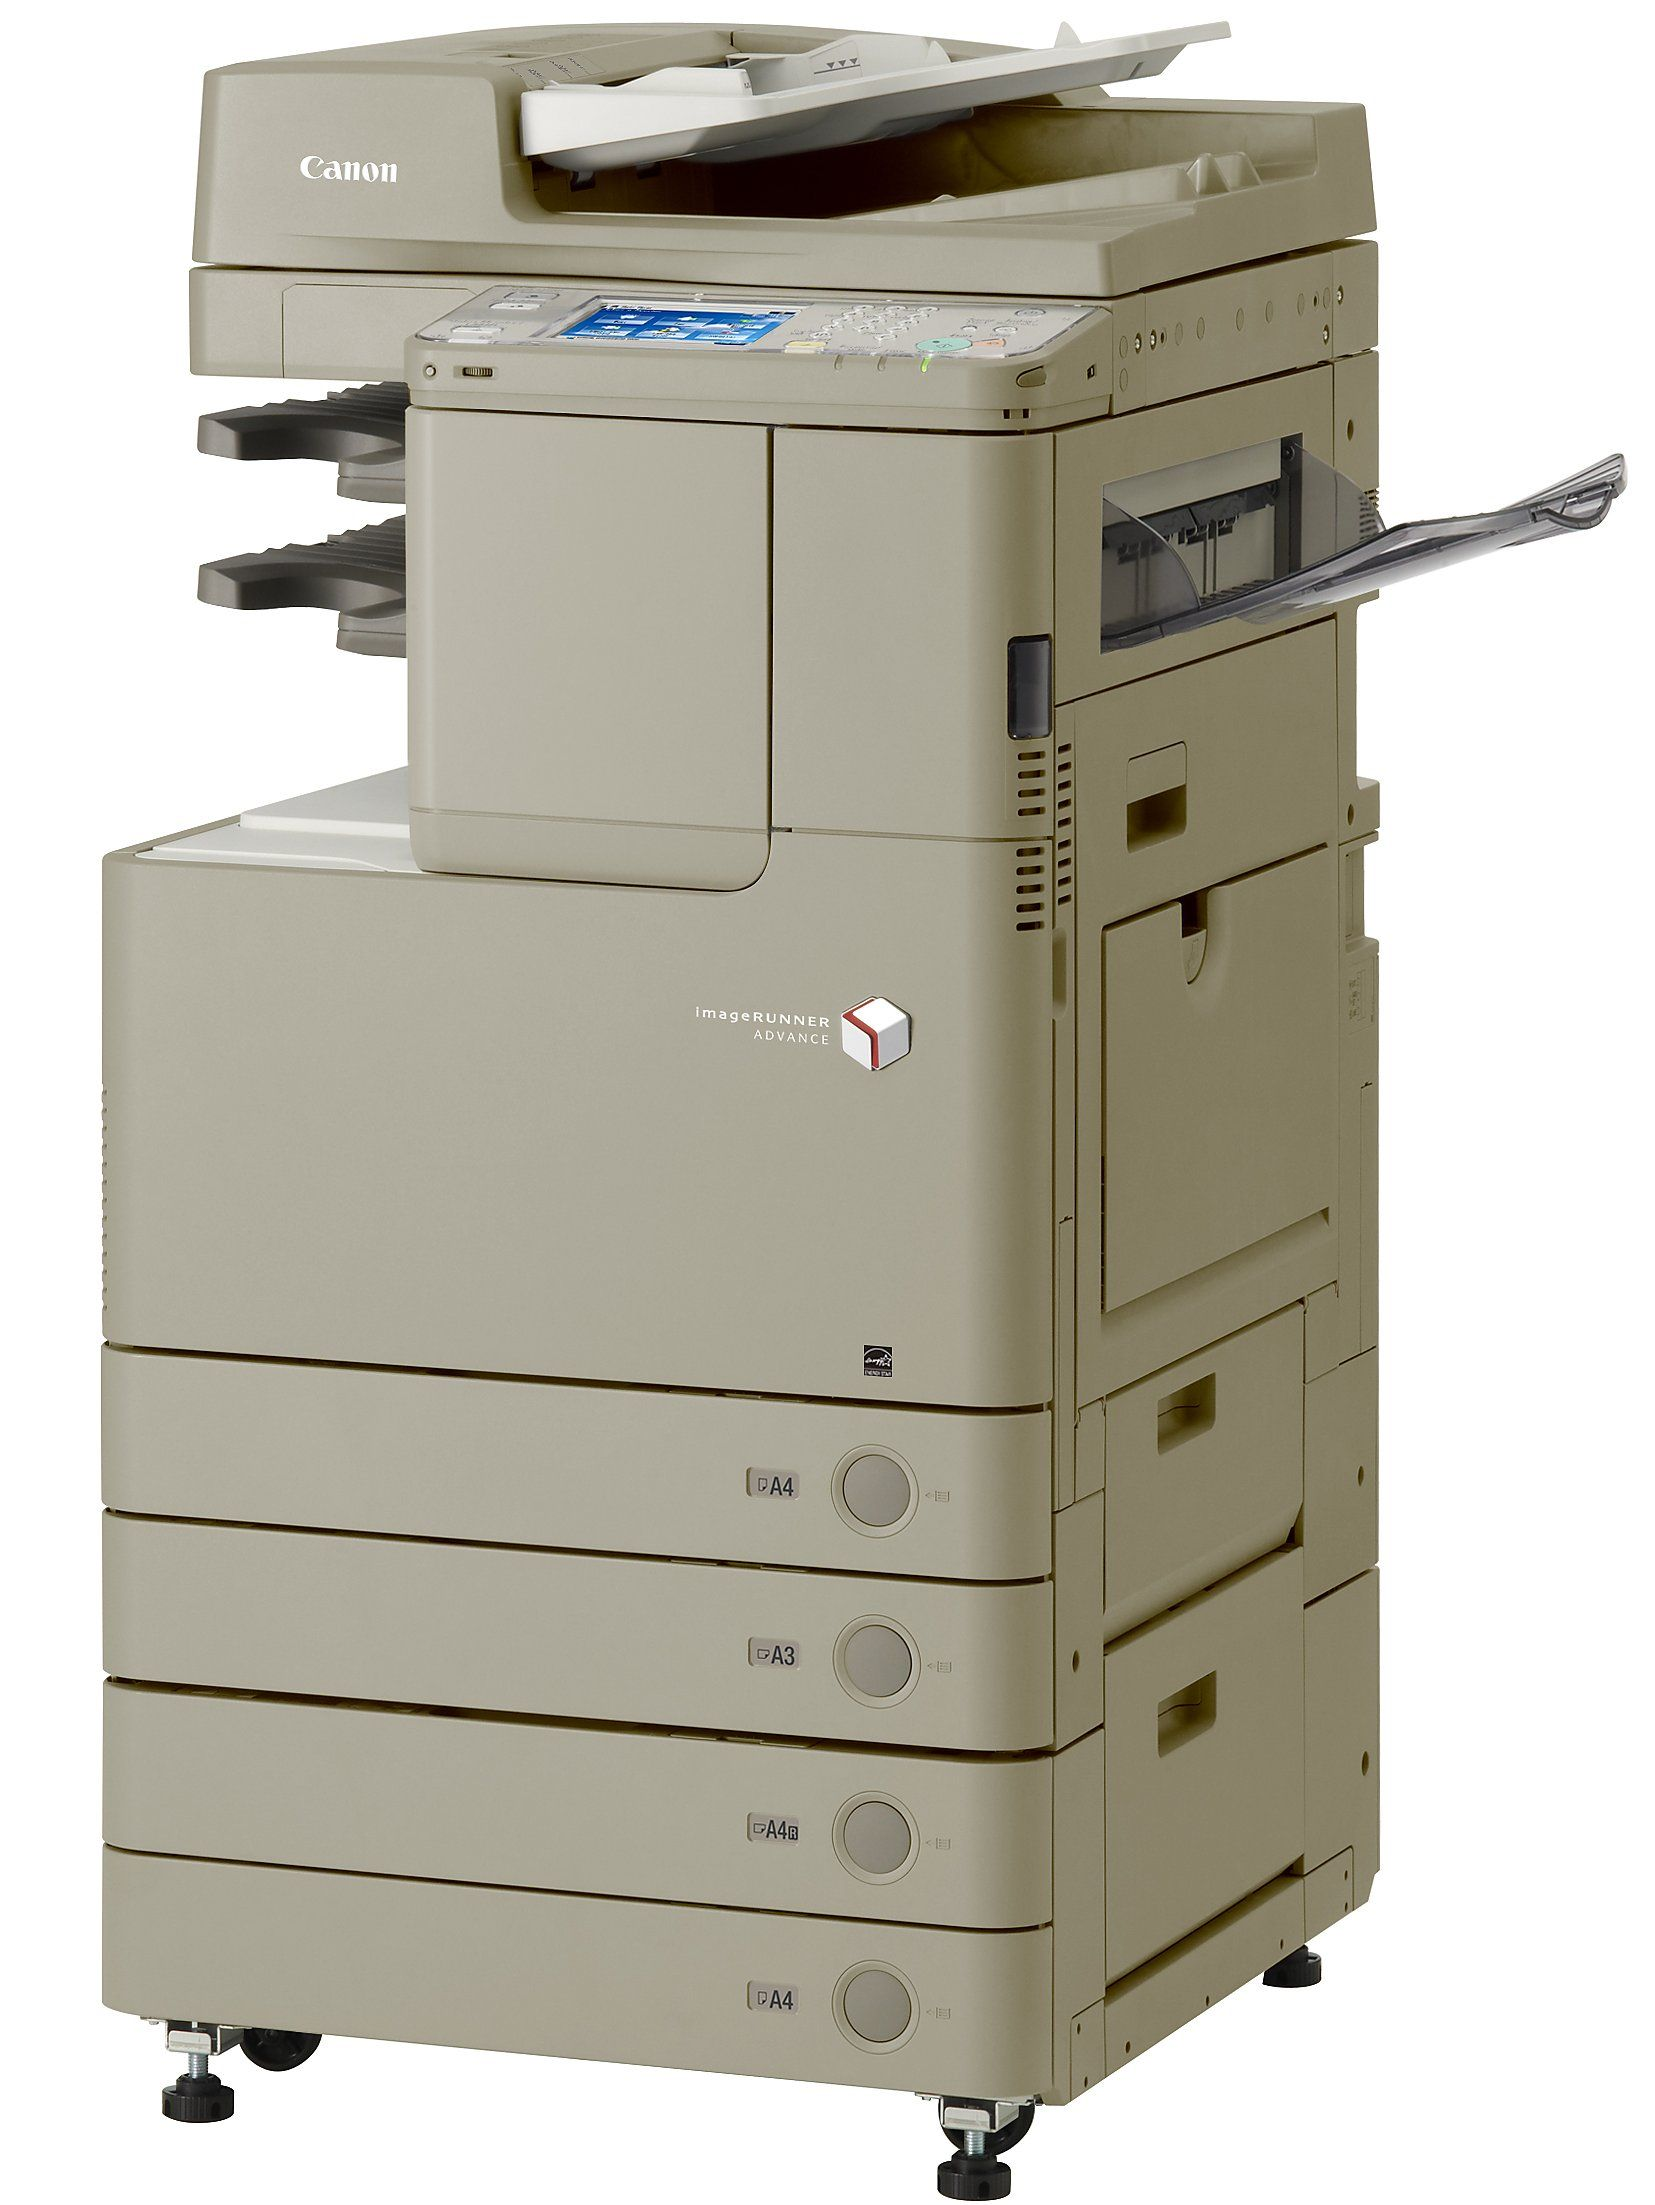 Canon imageRUNNER ADVANCE C2025i postafiók-funkcióval